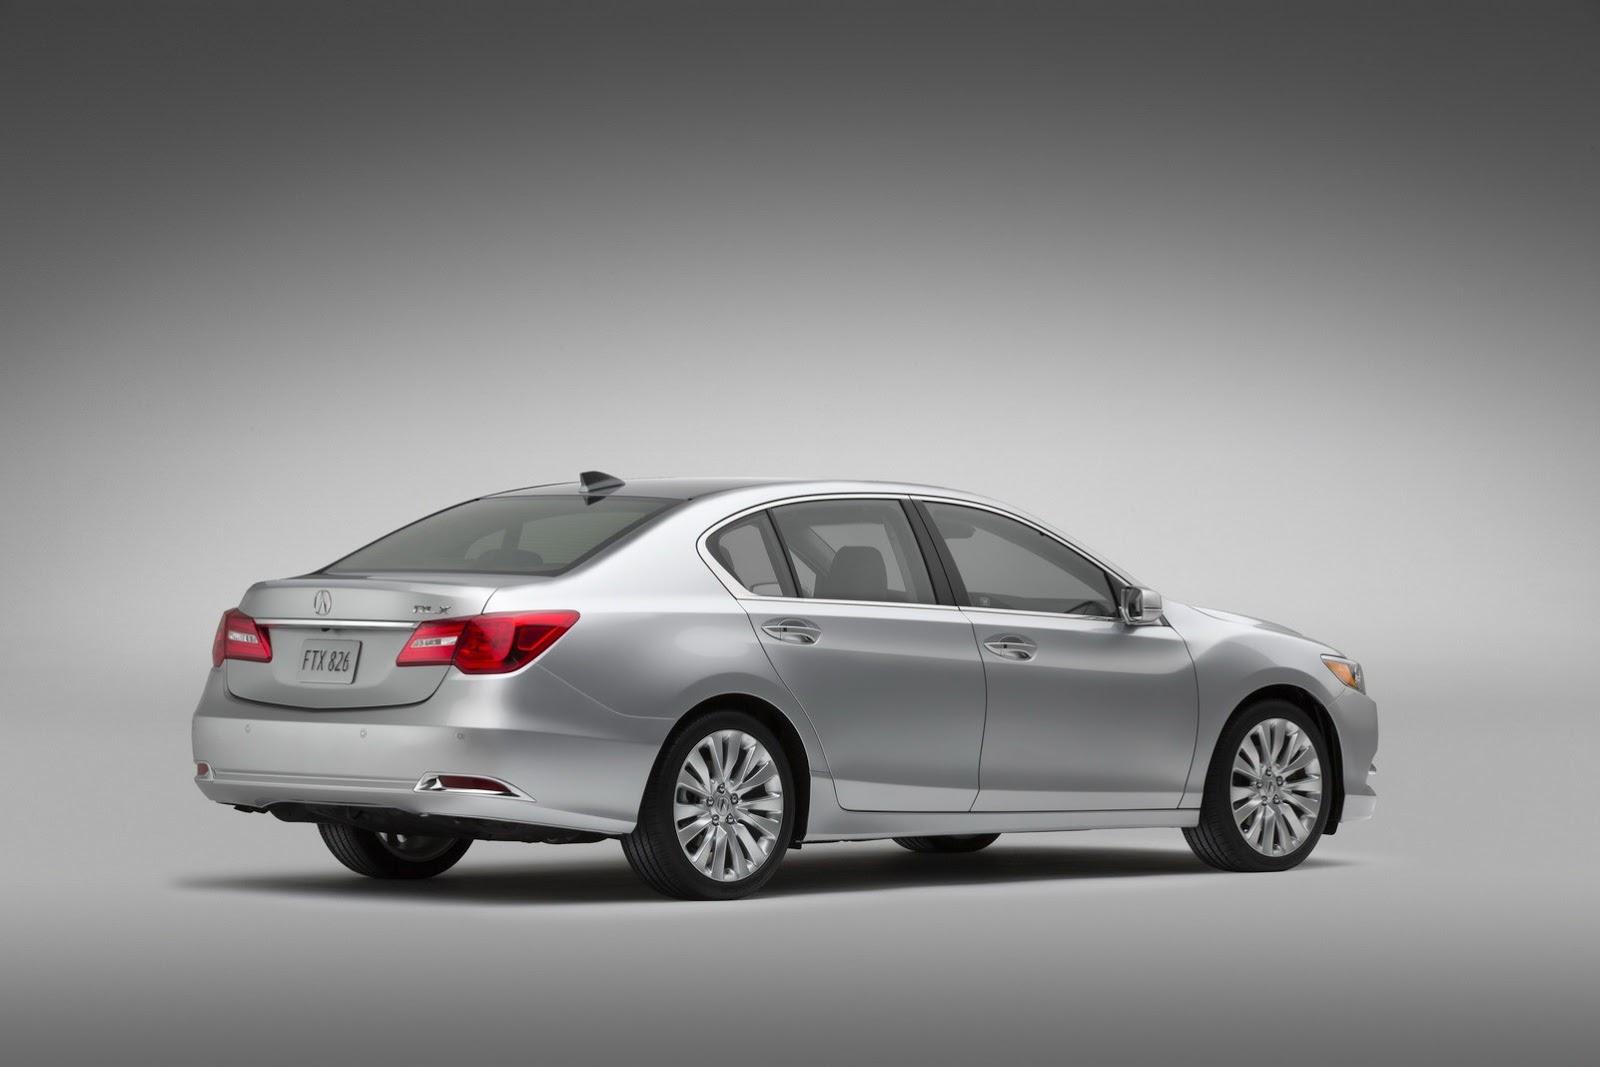 Acura rlx 2012